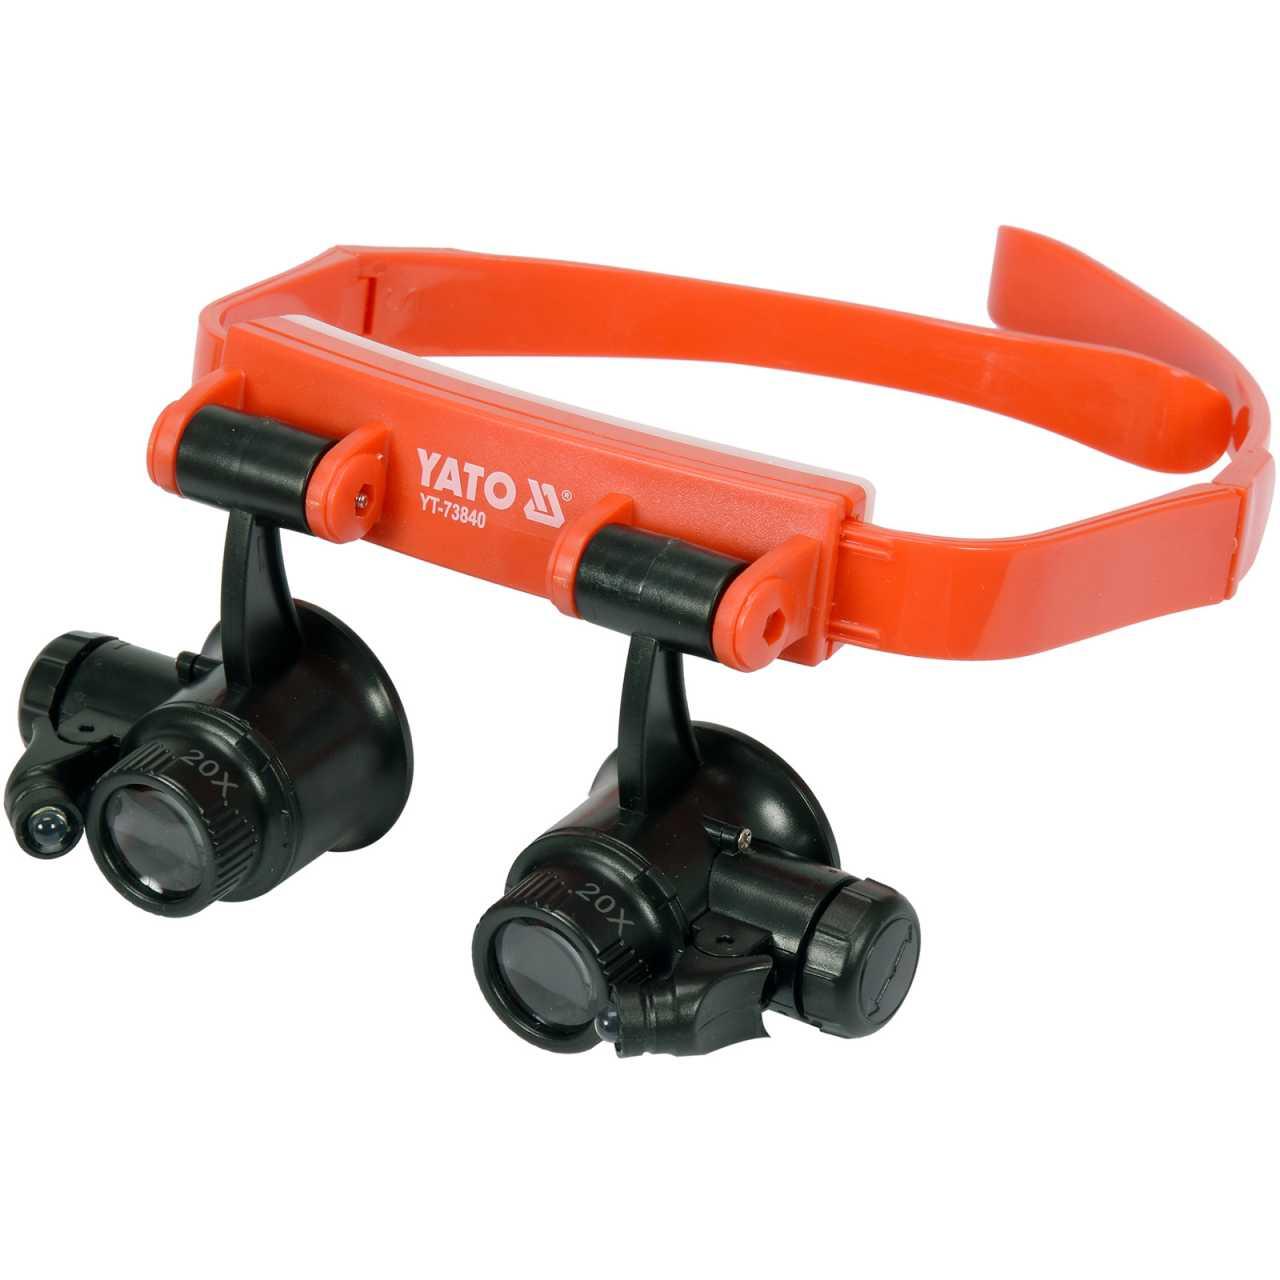 YATO Profi Kopfband-Lupenbrille mit Beleuchtung | Binokular | 10x/15x/20x/25x | YT-73840